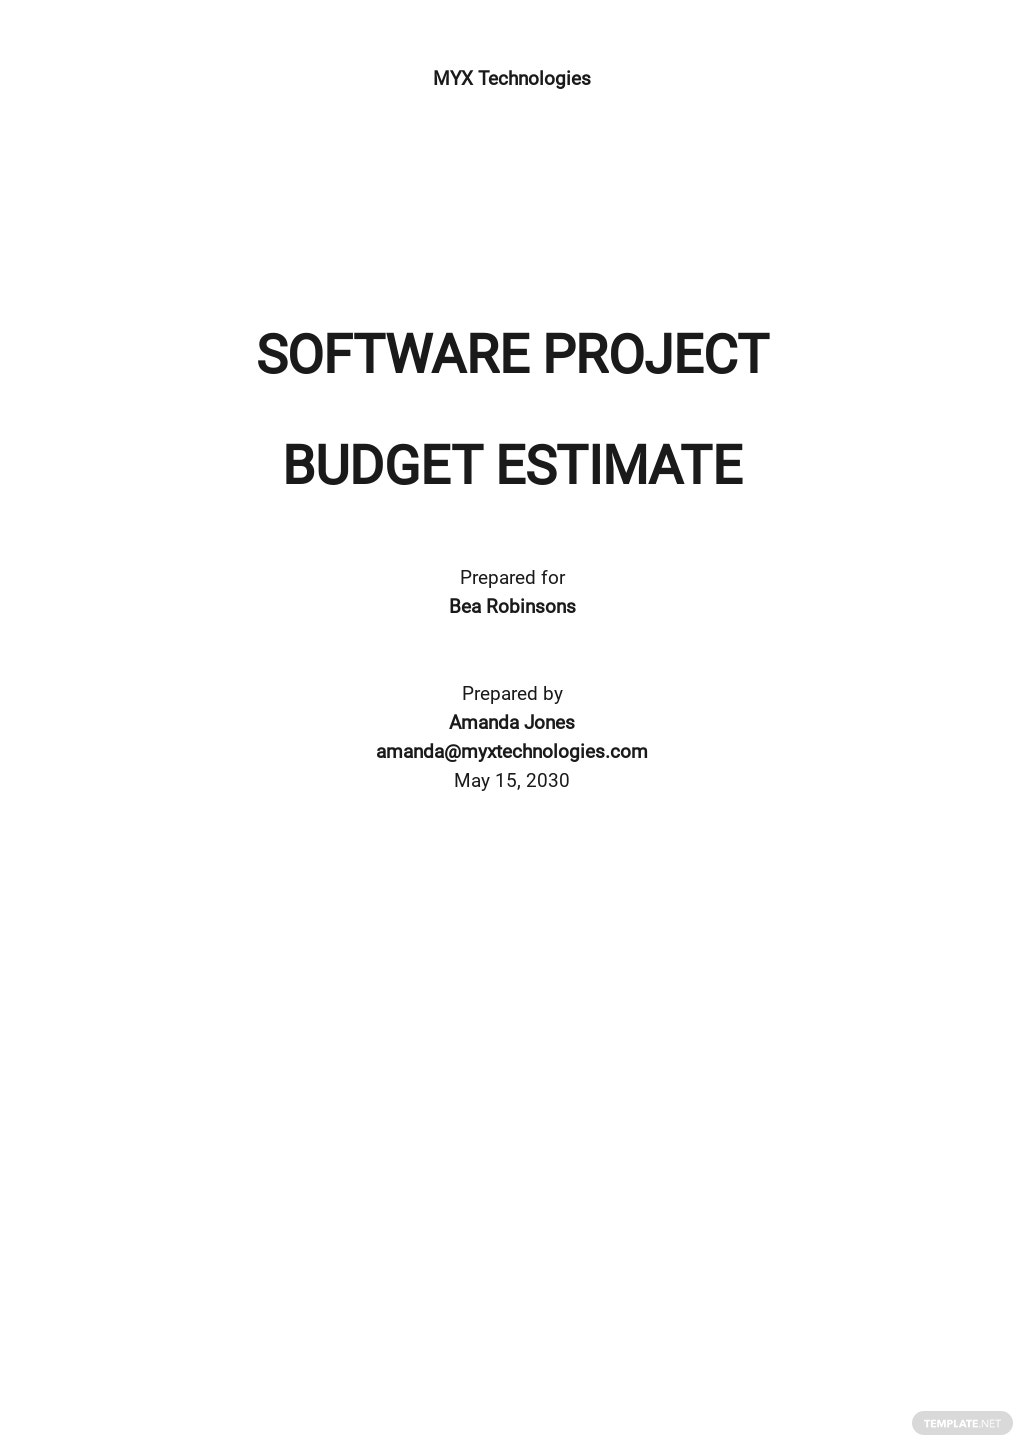 Software Project Budget Estimate Template.jpe